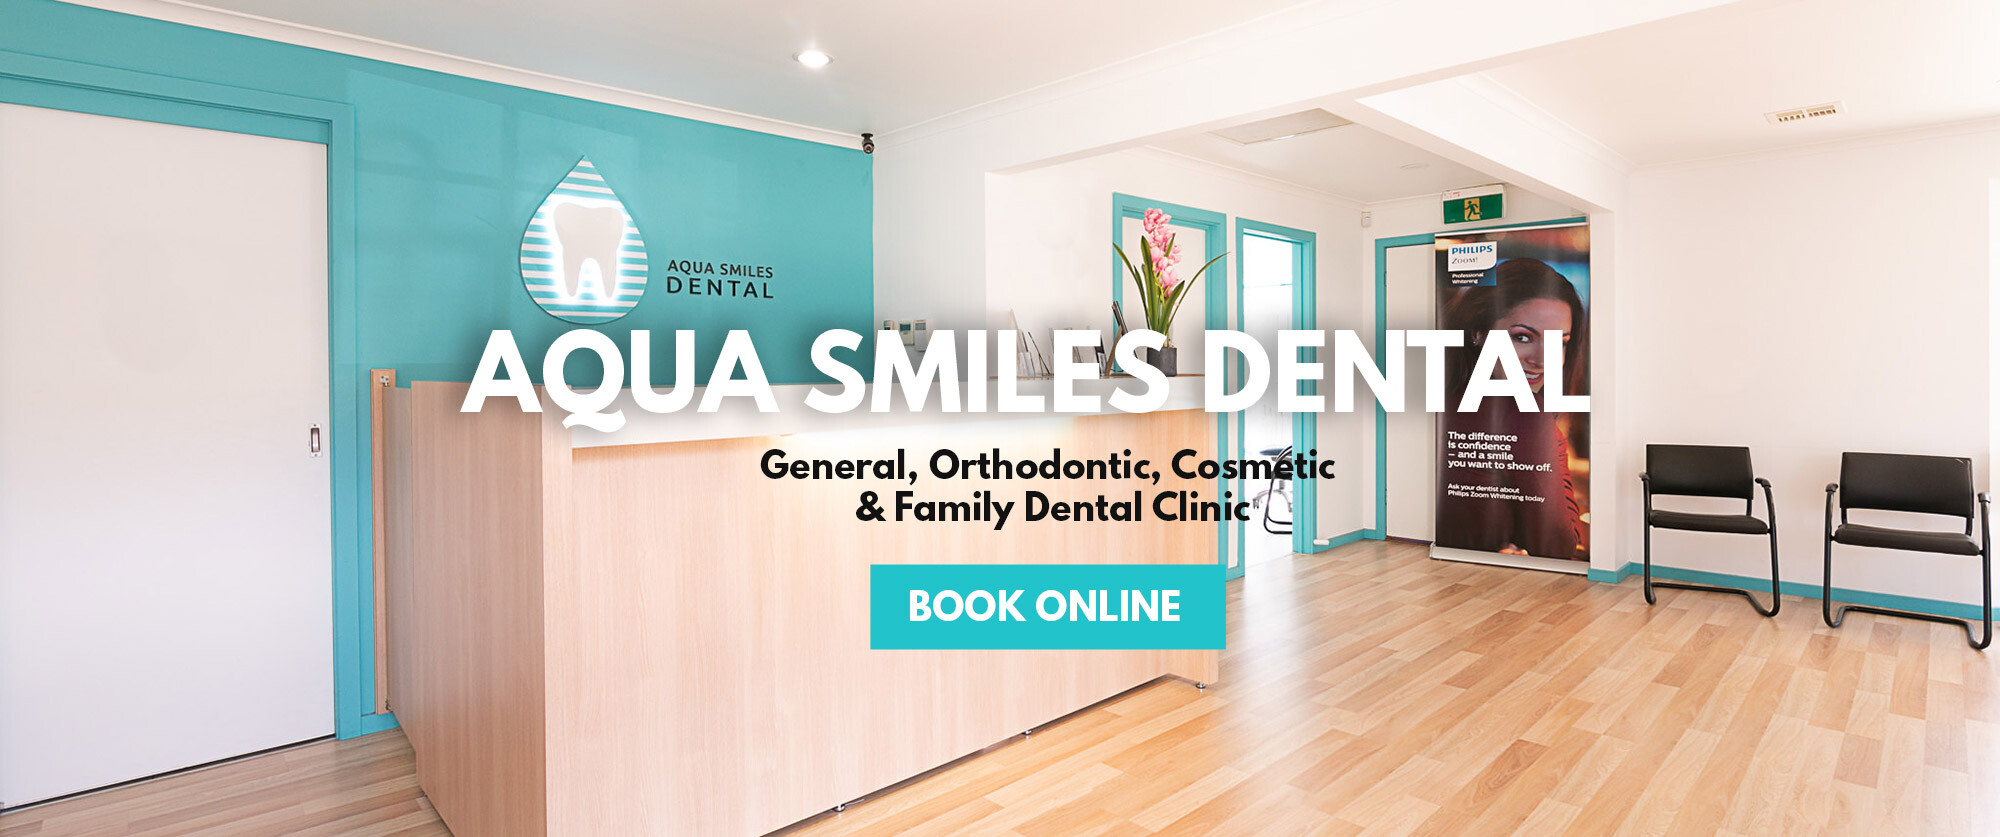 Aqua Smiles Dental Hoppers Crossing